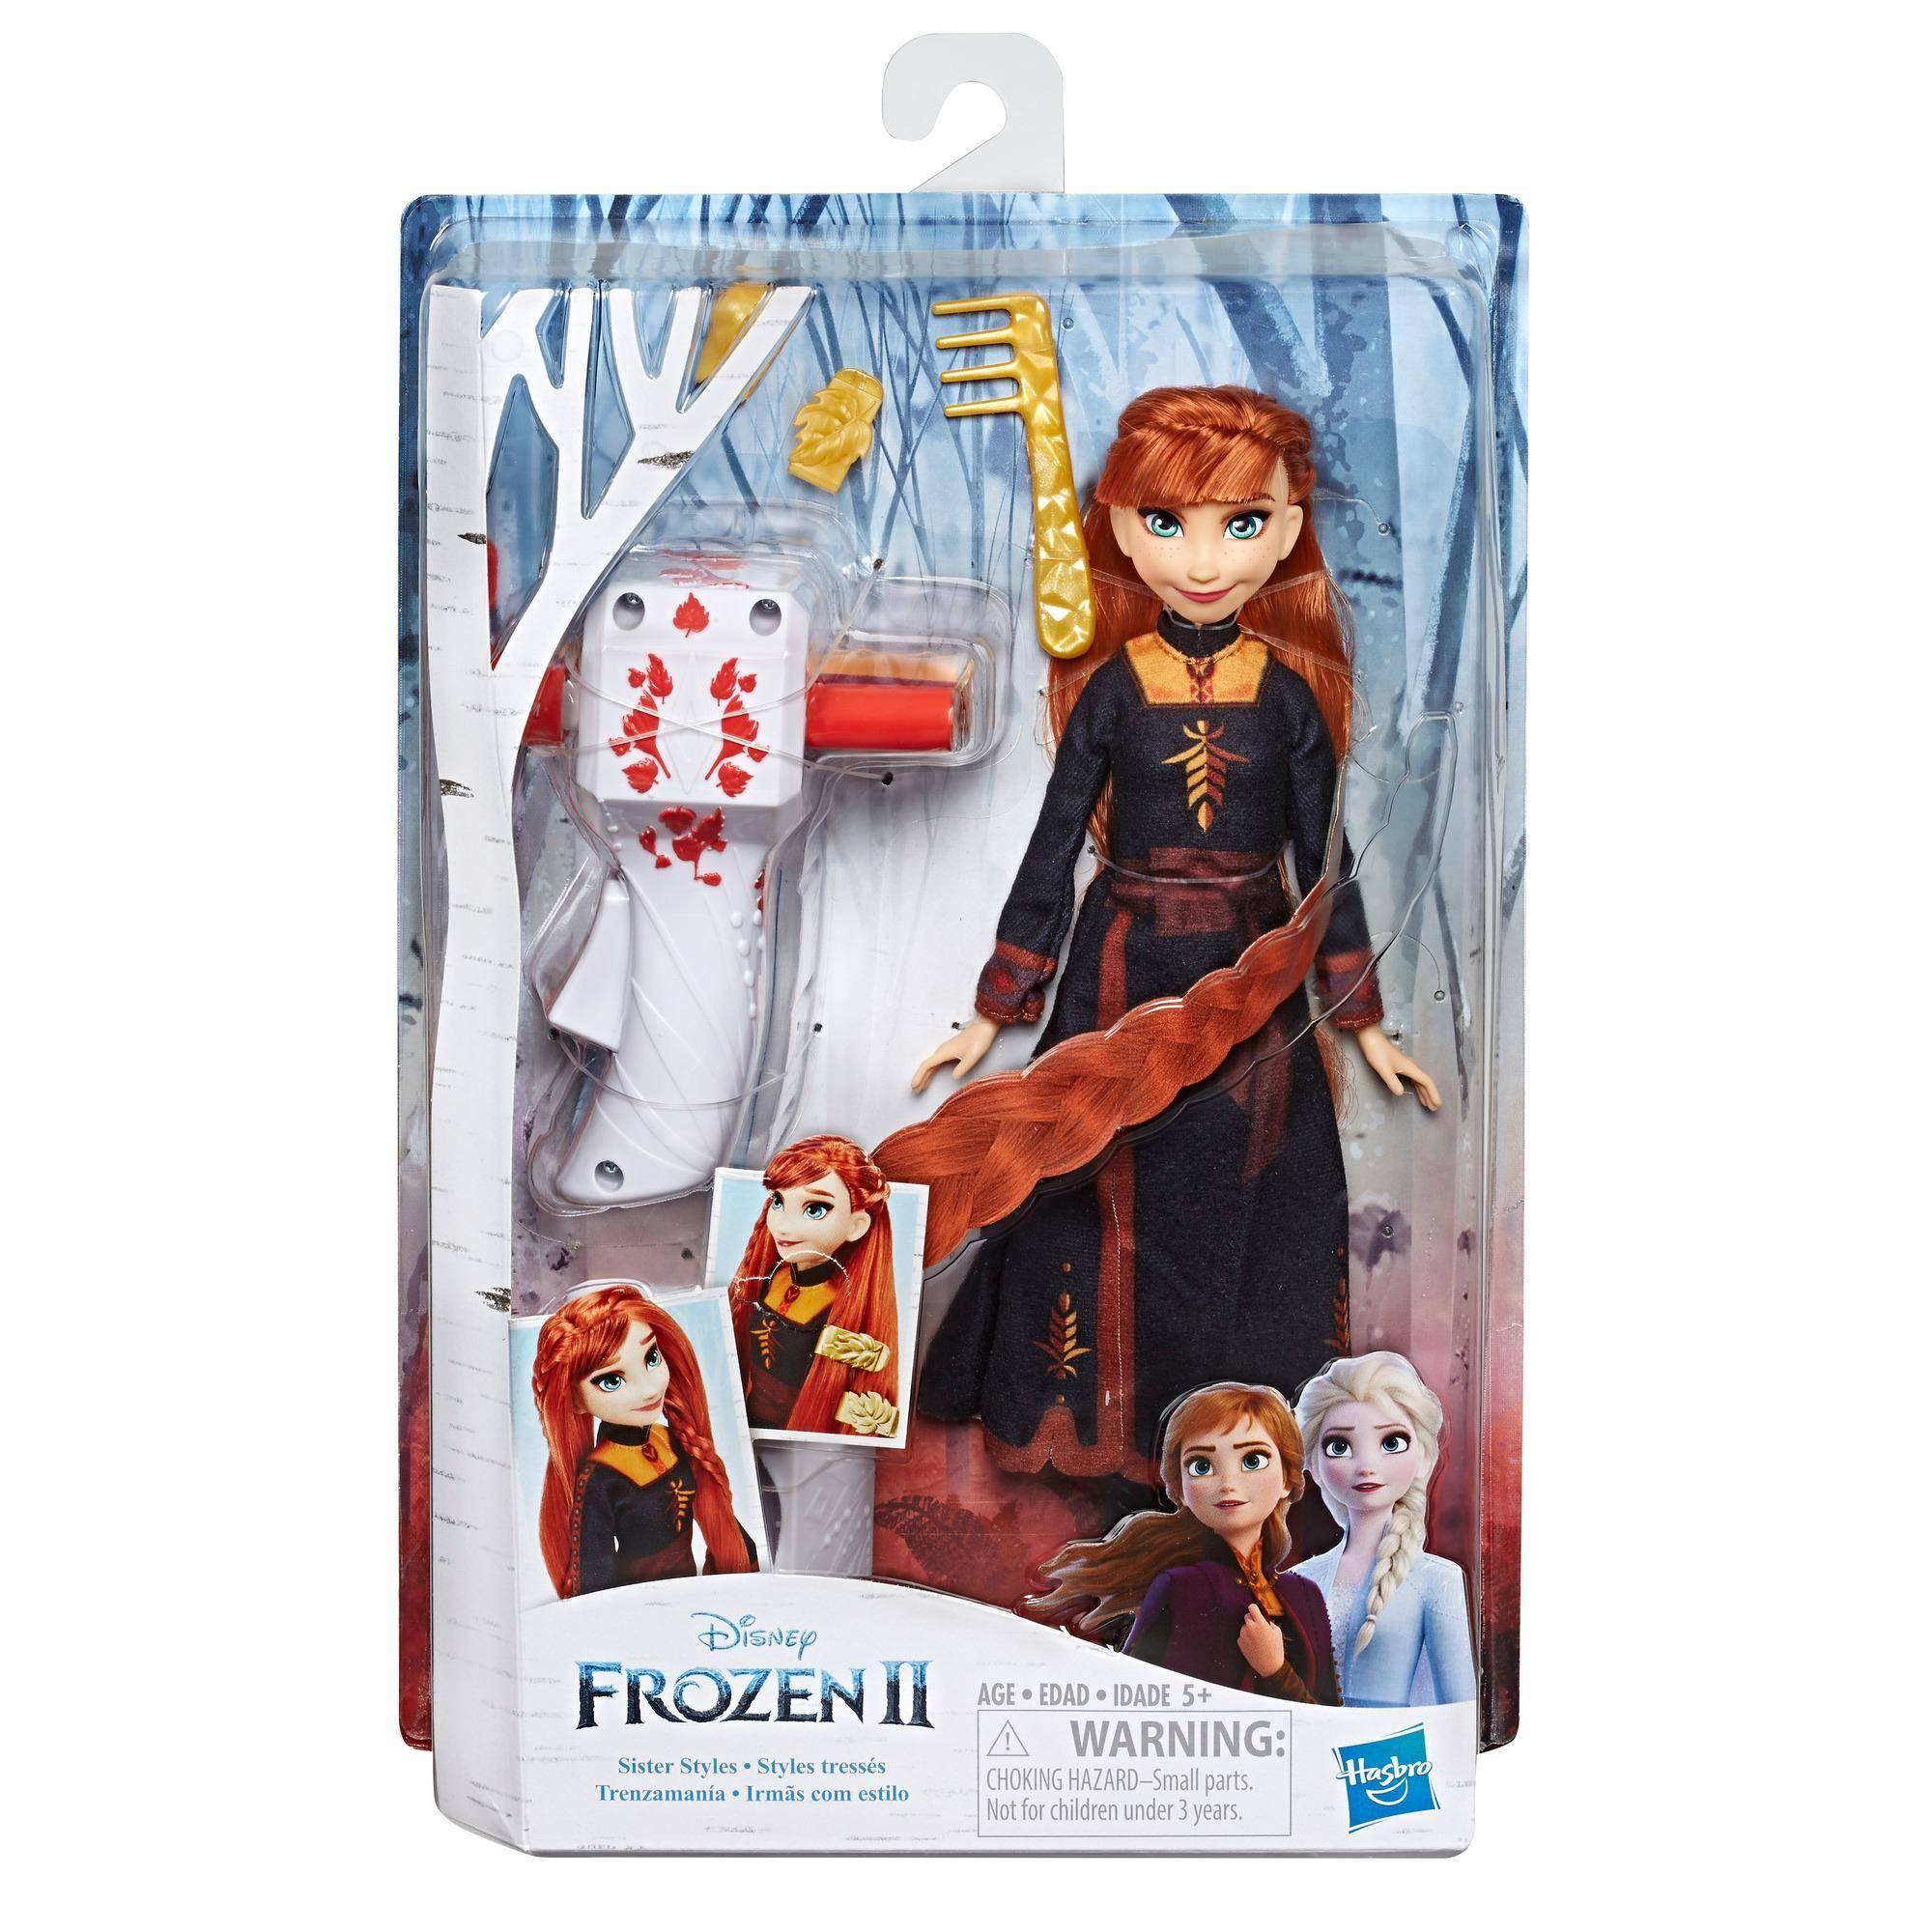 Frozen 2 - Boneca Anna Lindas Tranças E7003 - Hasbro E6950